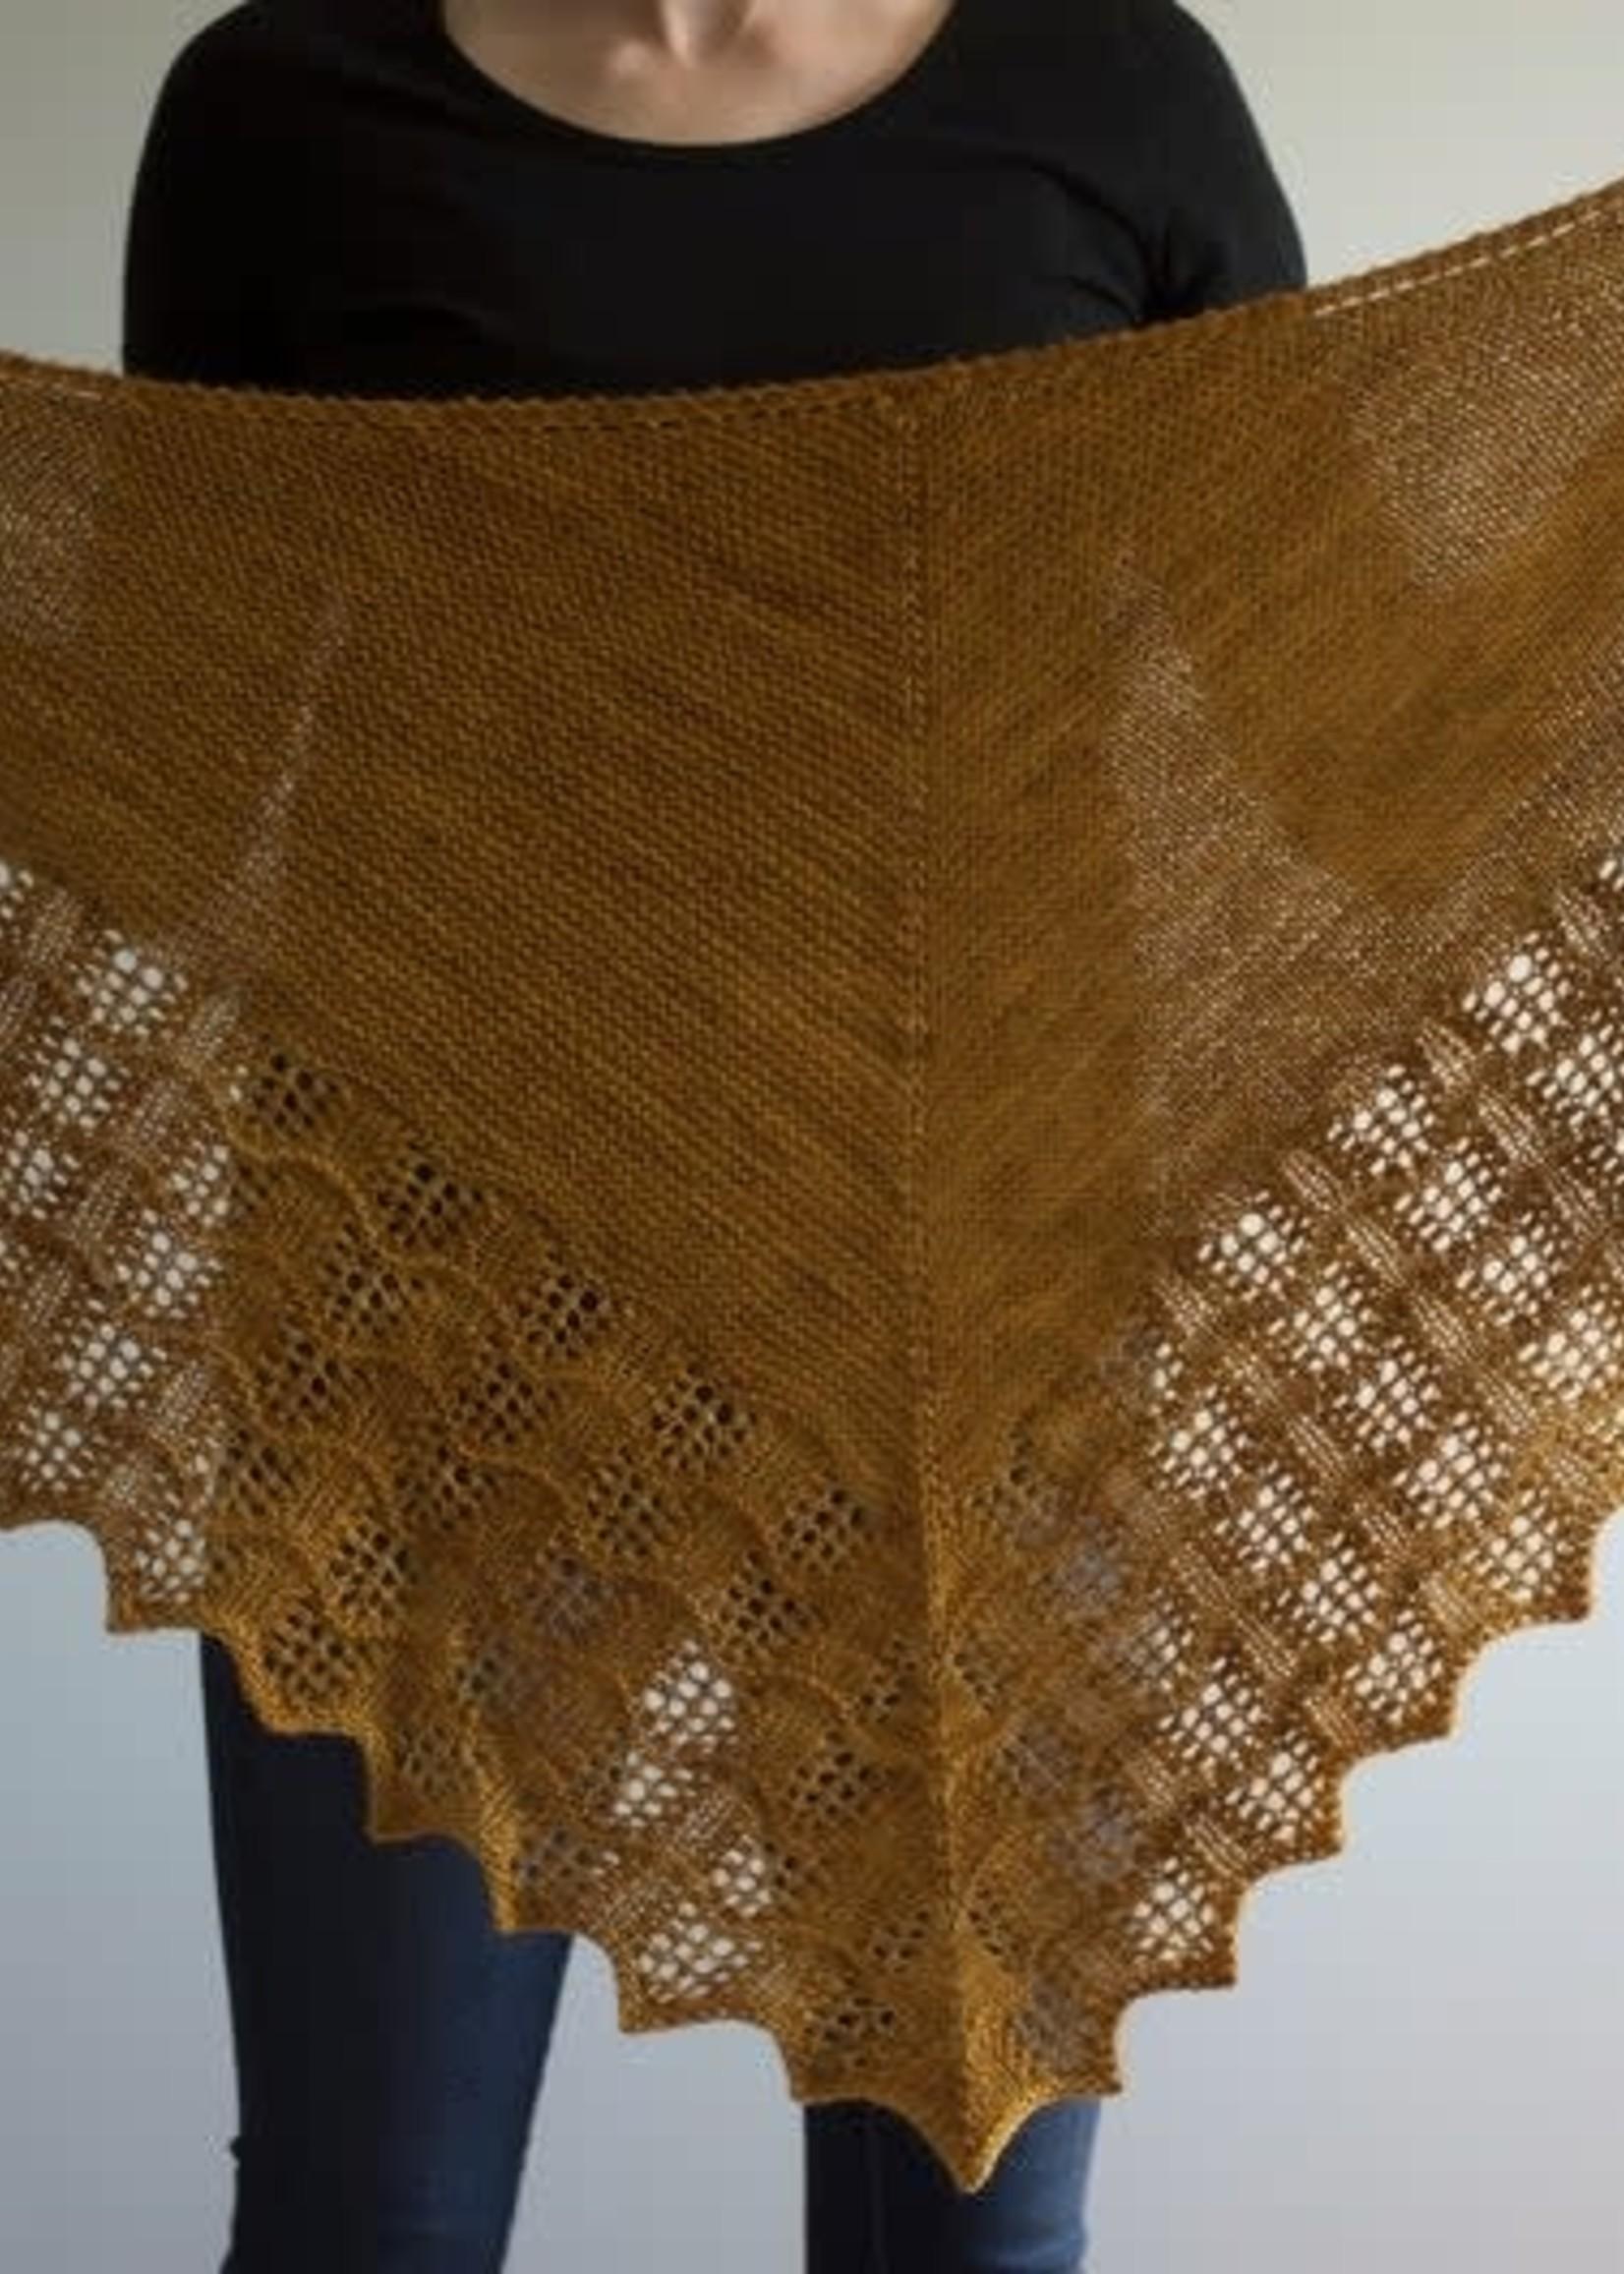 Knox Mountain Knit Co. Knox Mountain Knit Co. - Jade Bay